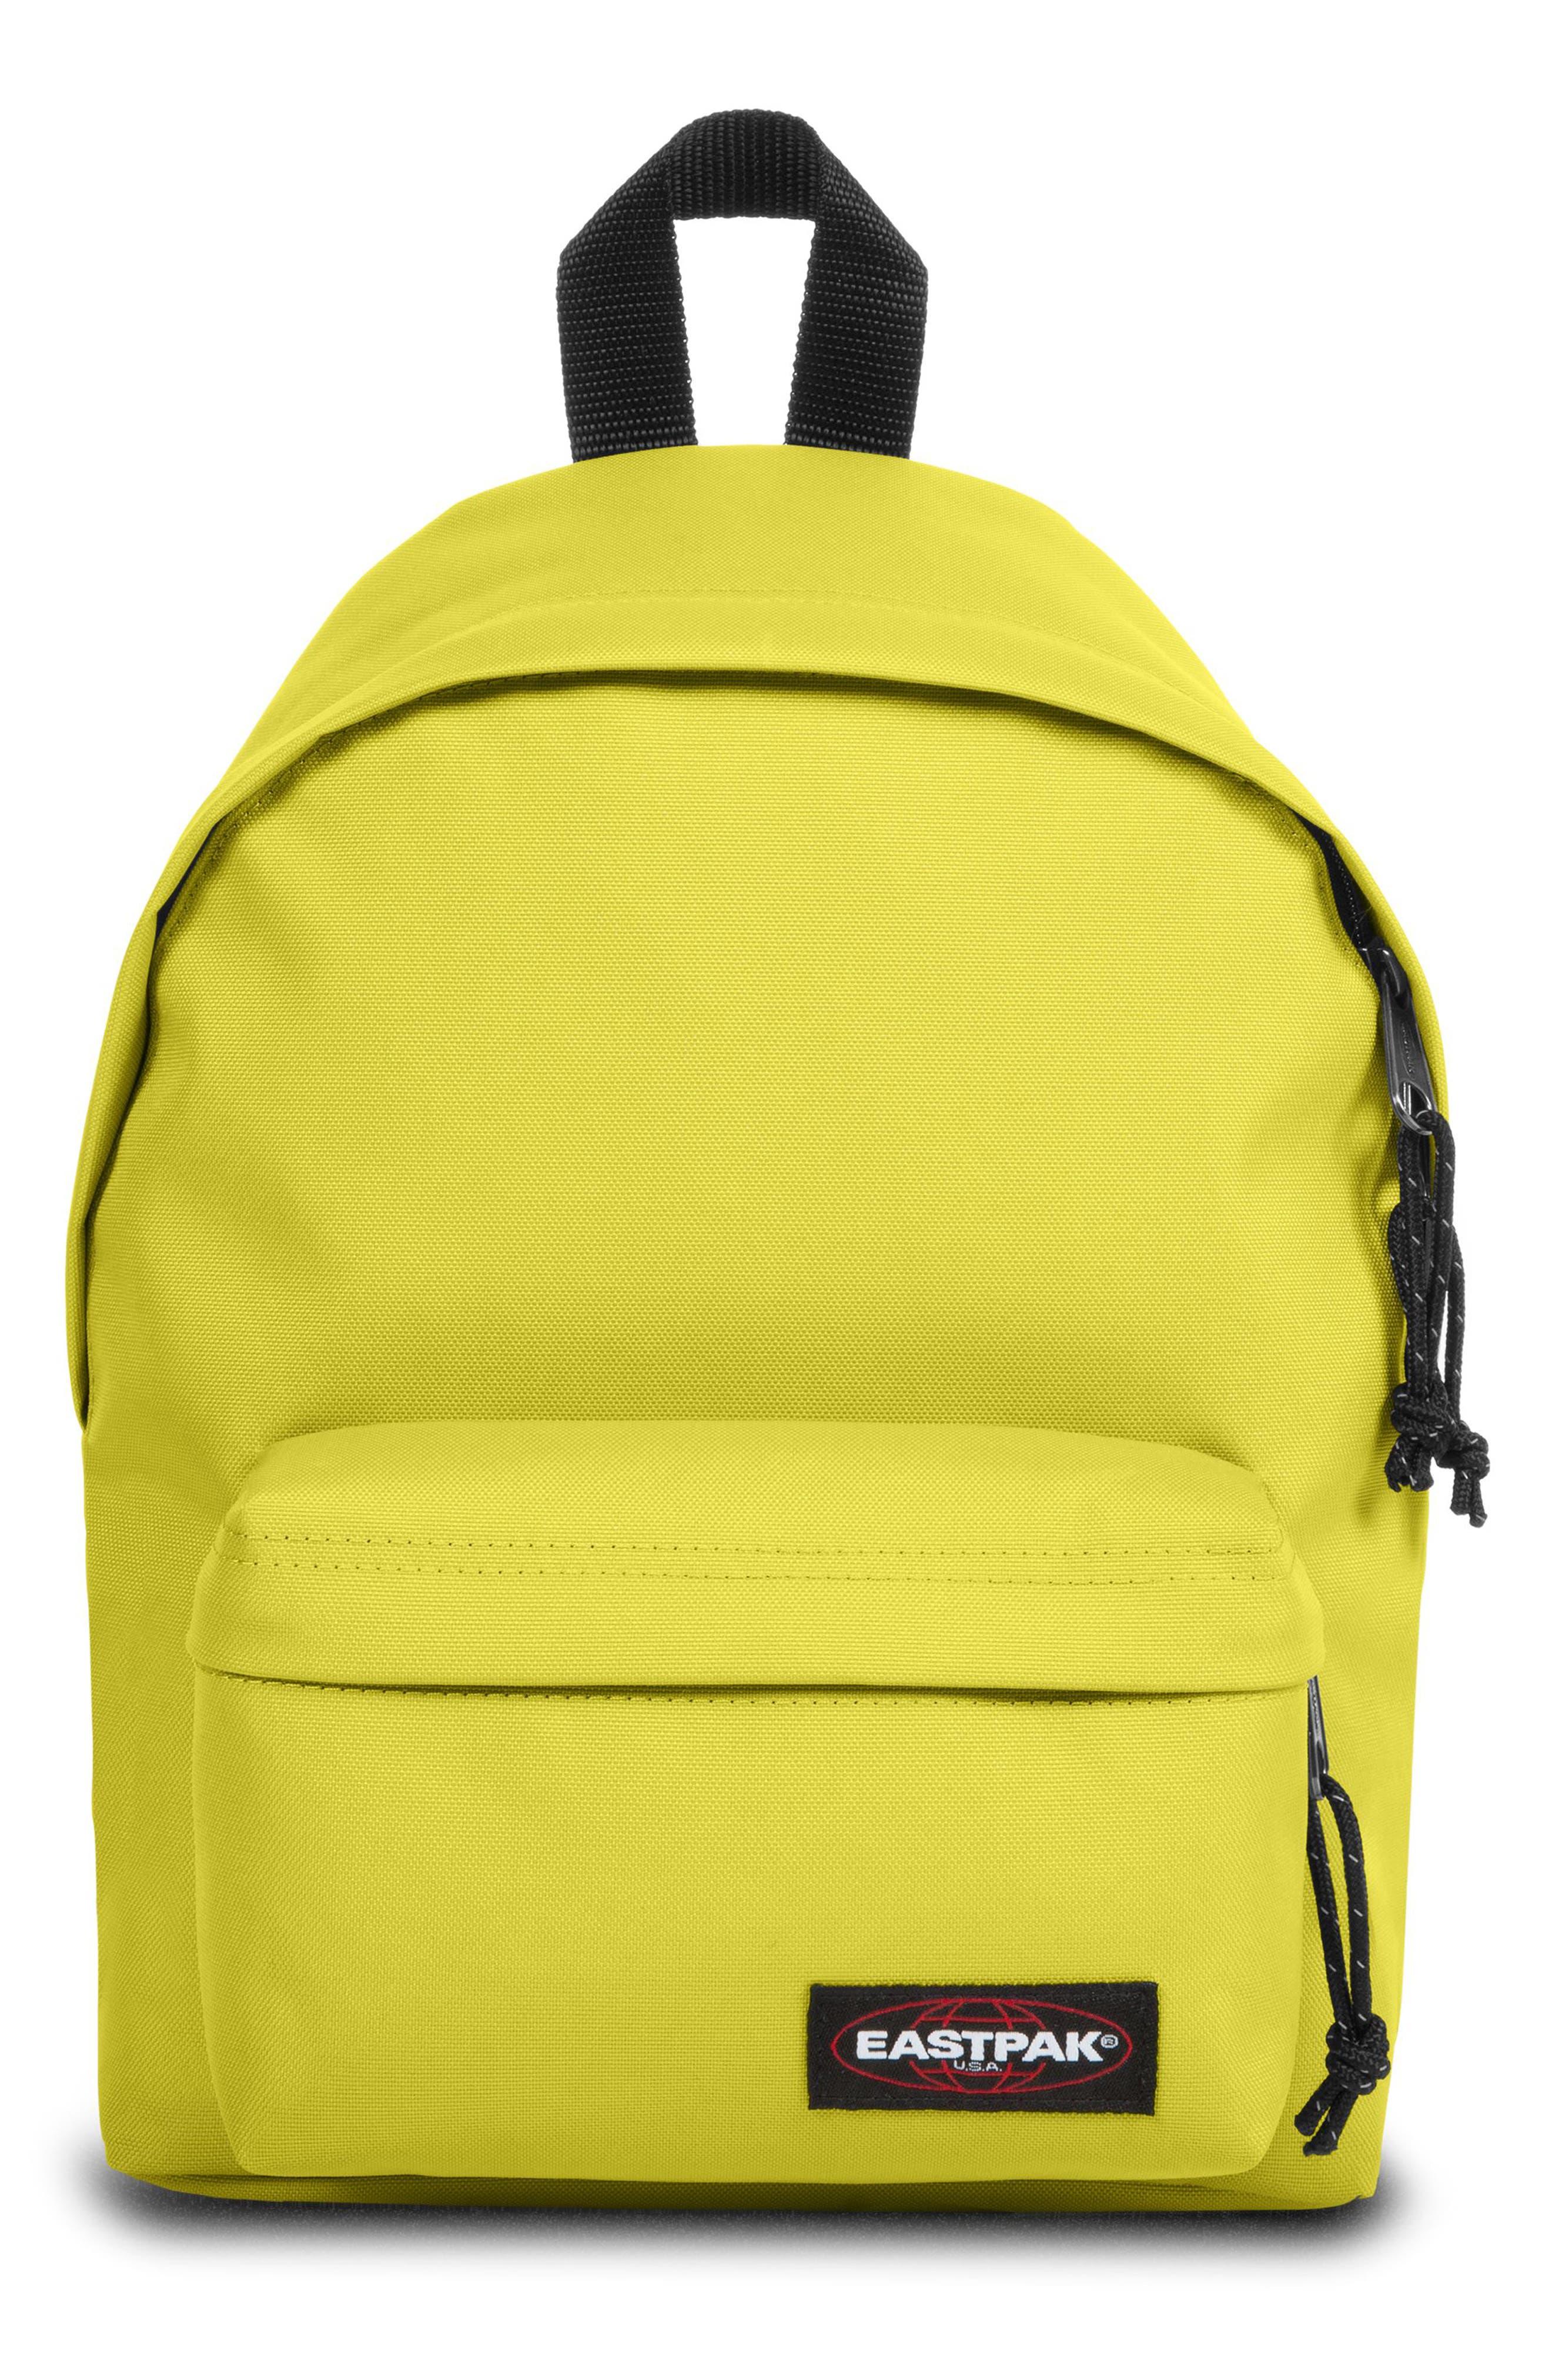 Eastpack Orbit Canvas Backpack - Yellow